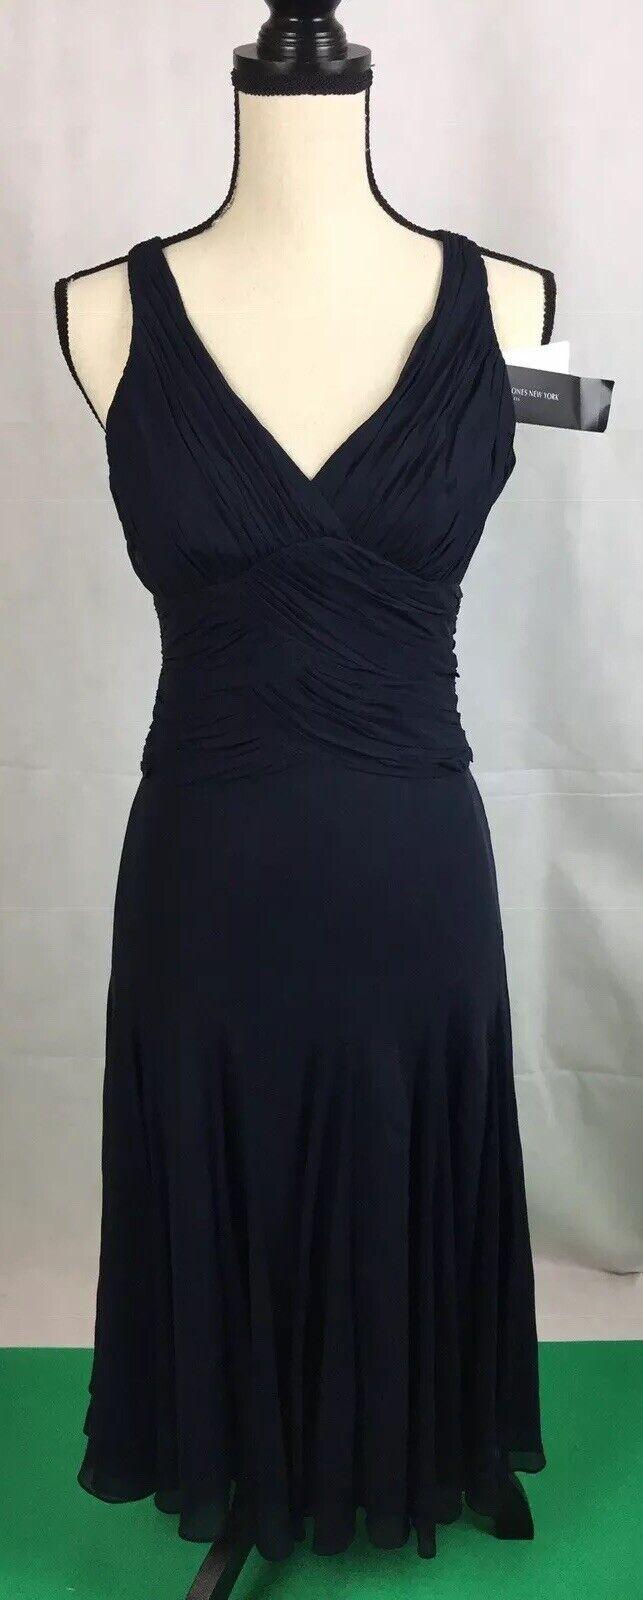 NWT Jones New York Navy Halter Top Evening Prom Dress Sz 4 Full Pleated Skirt